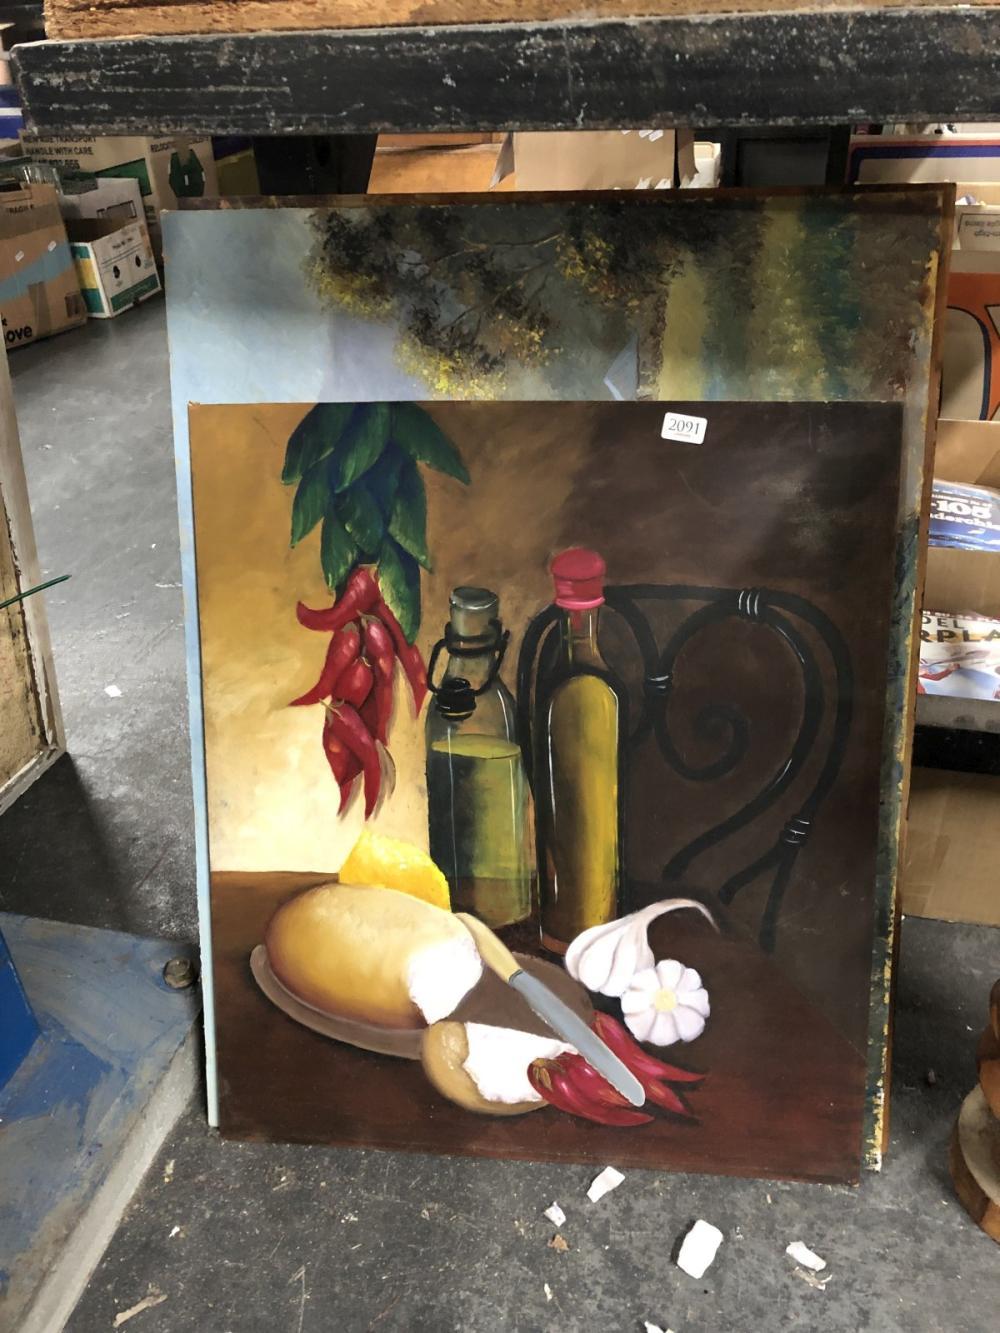 3 Oils on Board, one still life, 2 landscapes